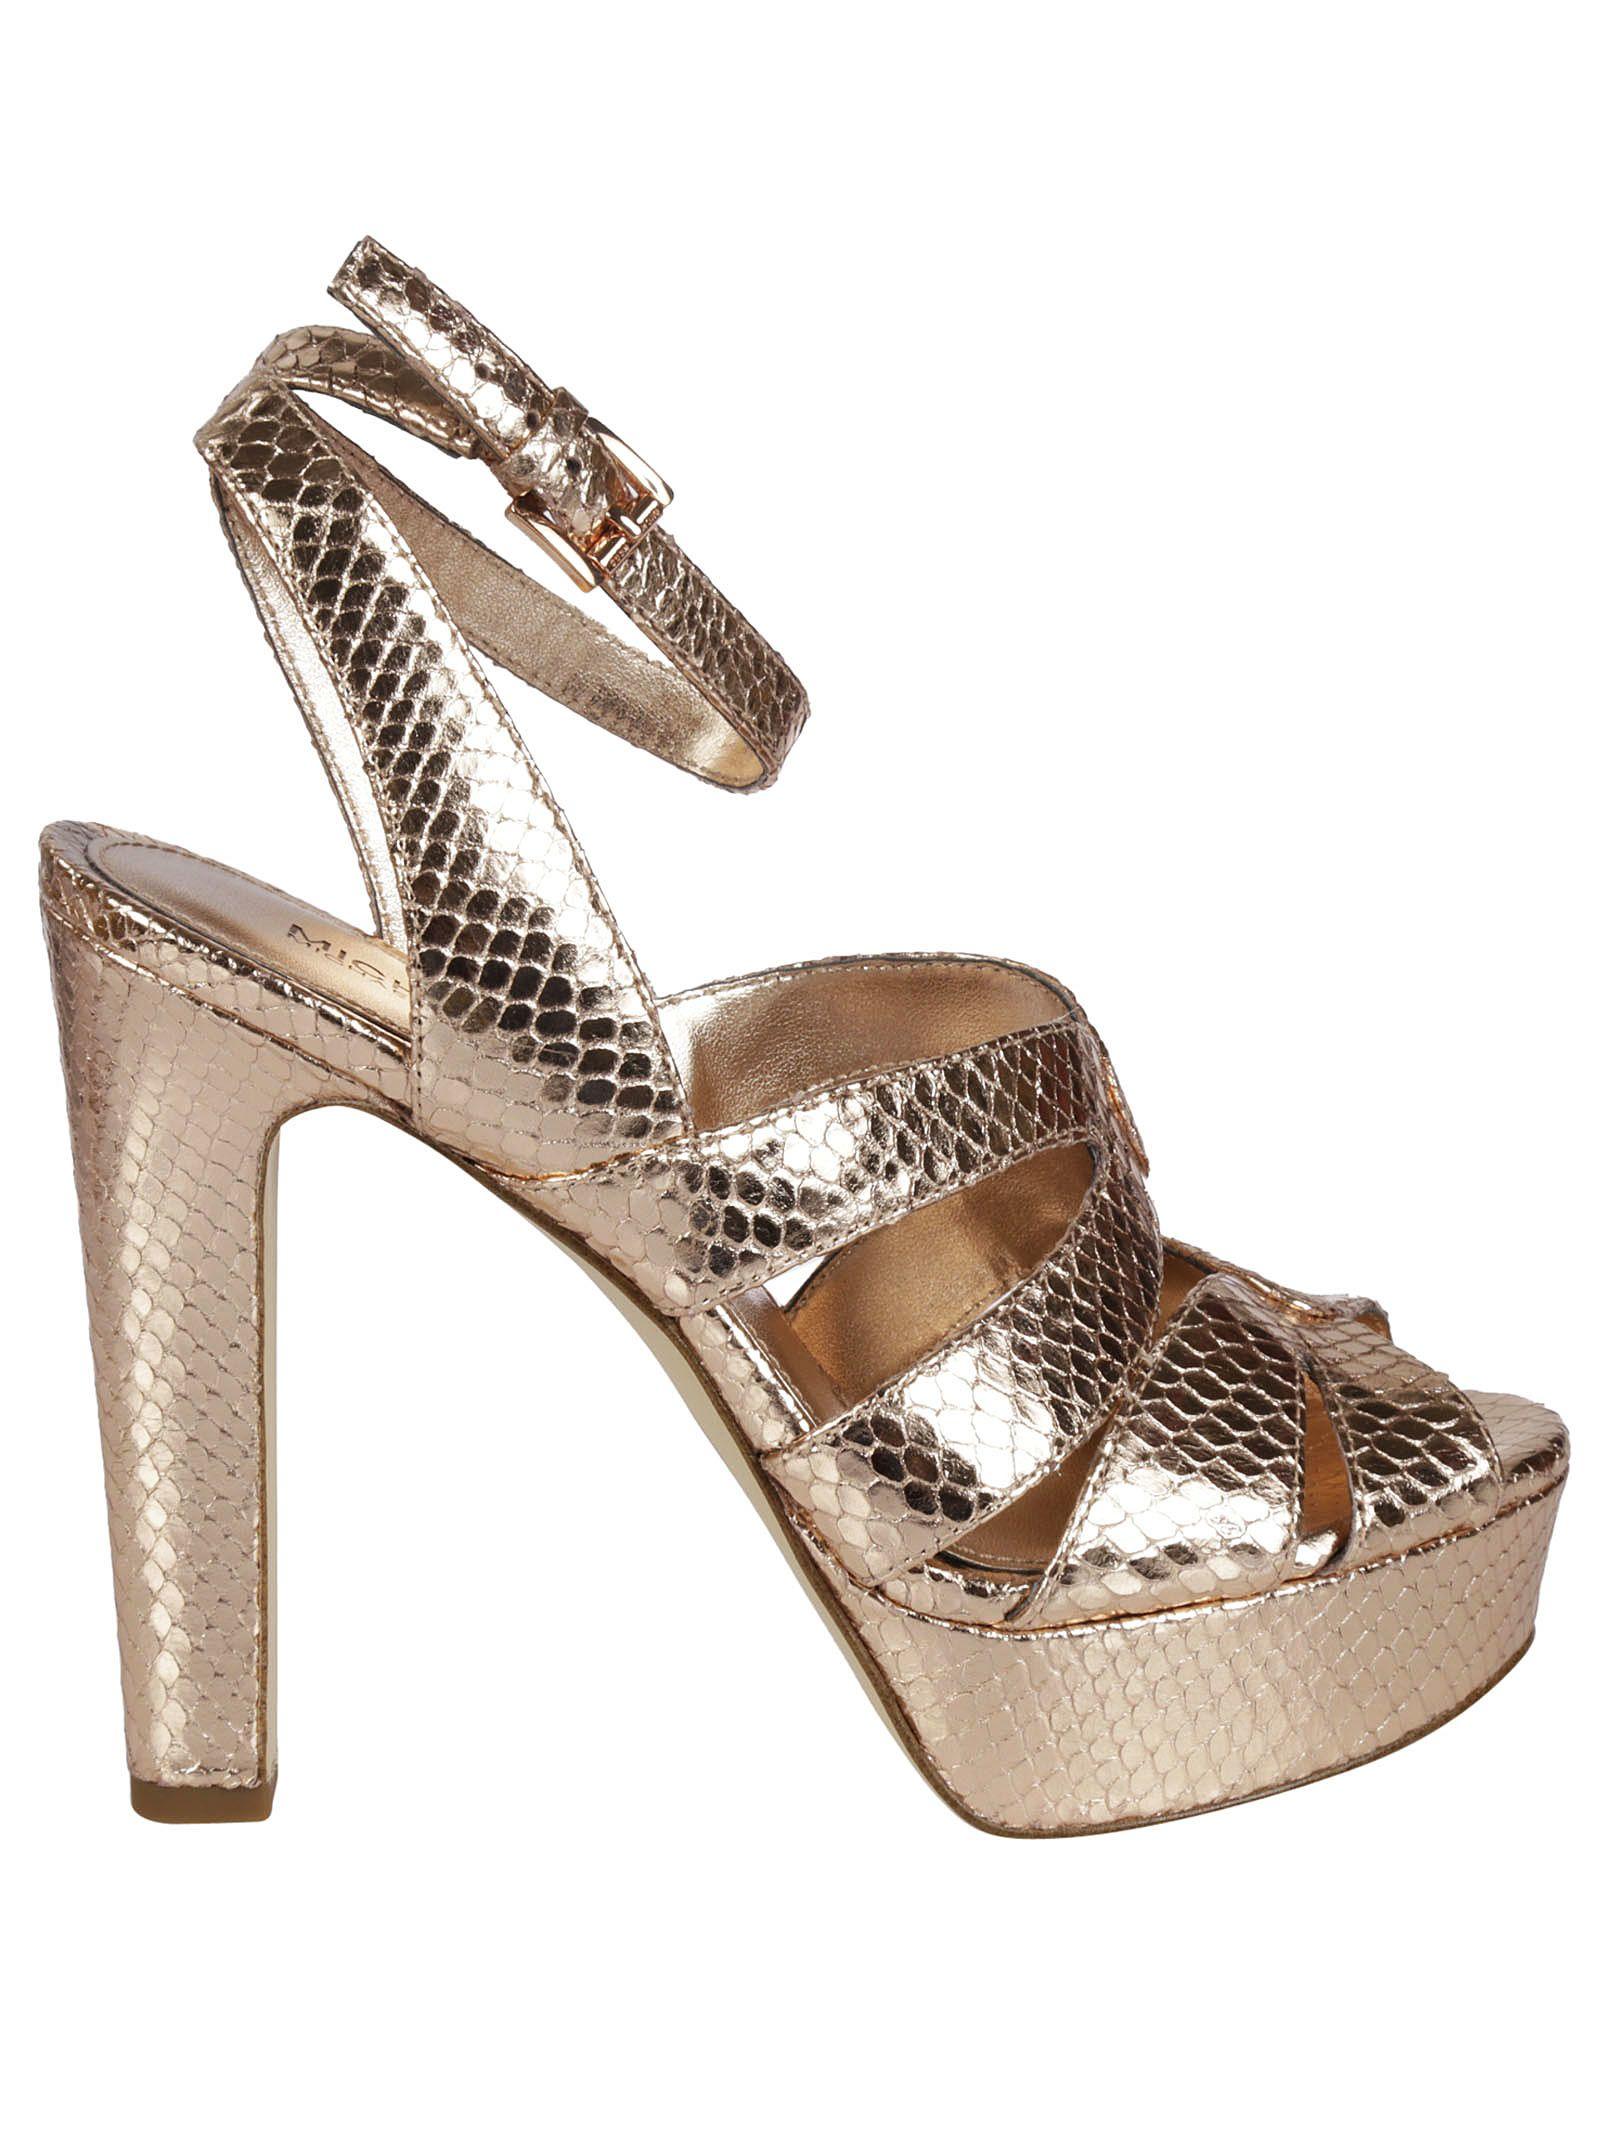 Michael Kors Winona Platform Sandals